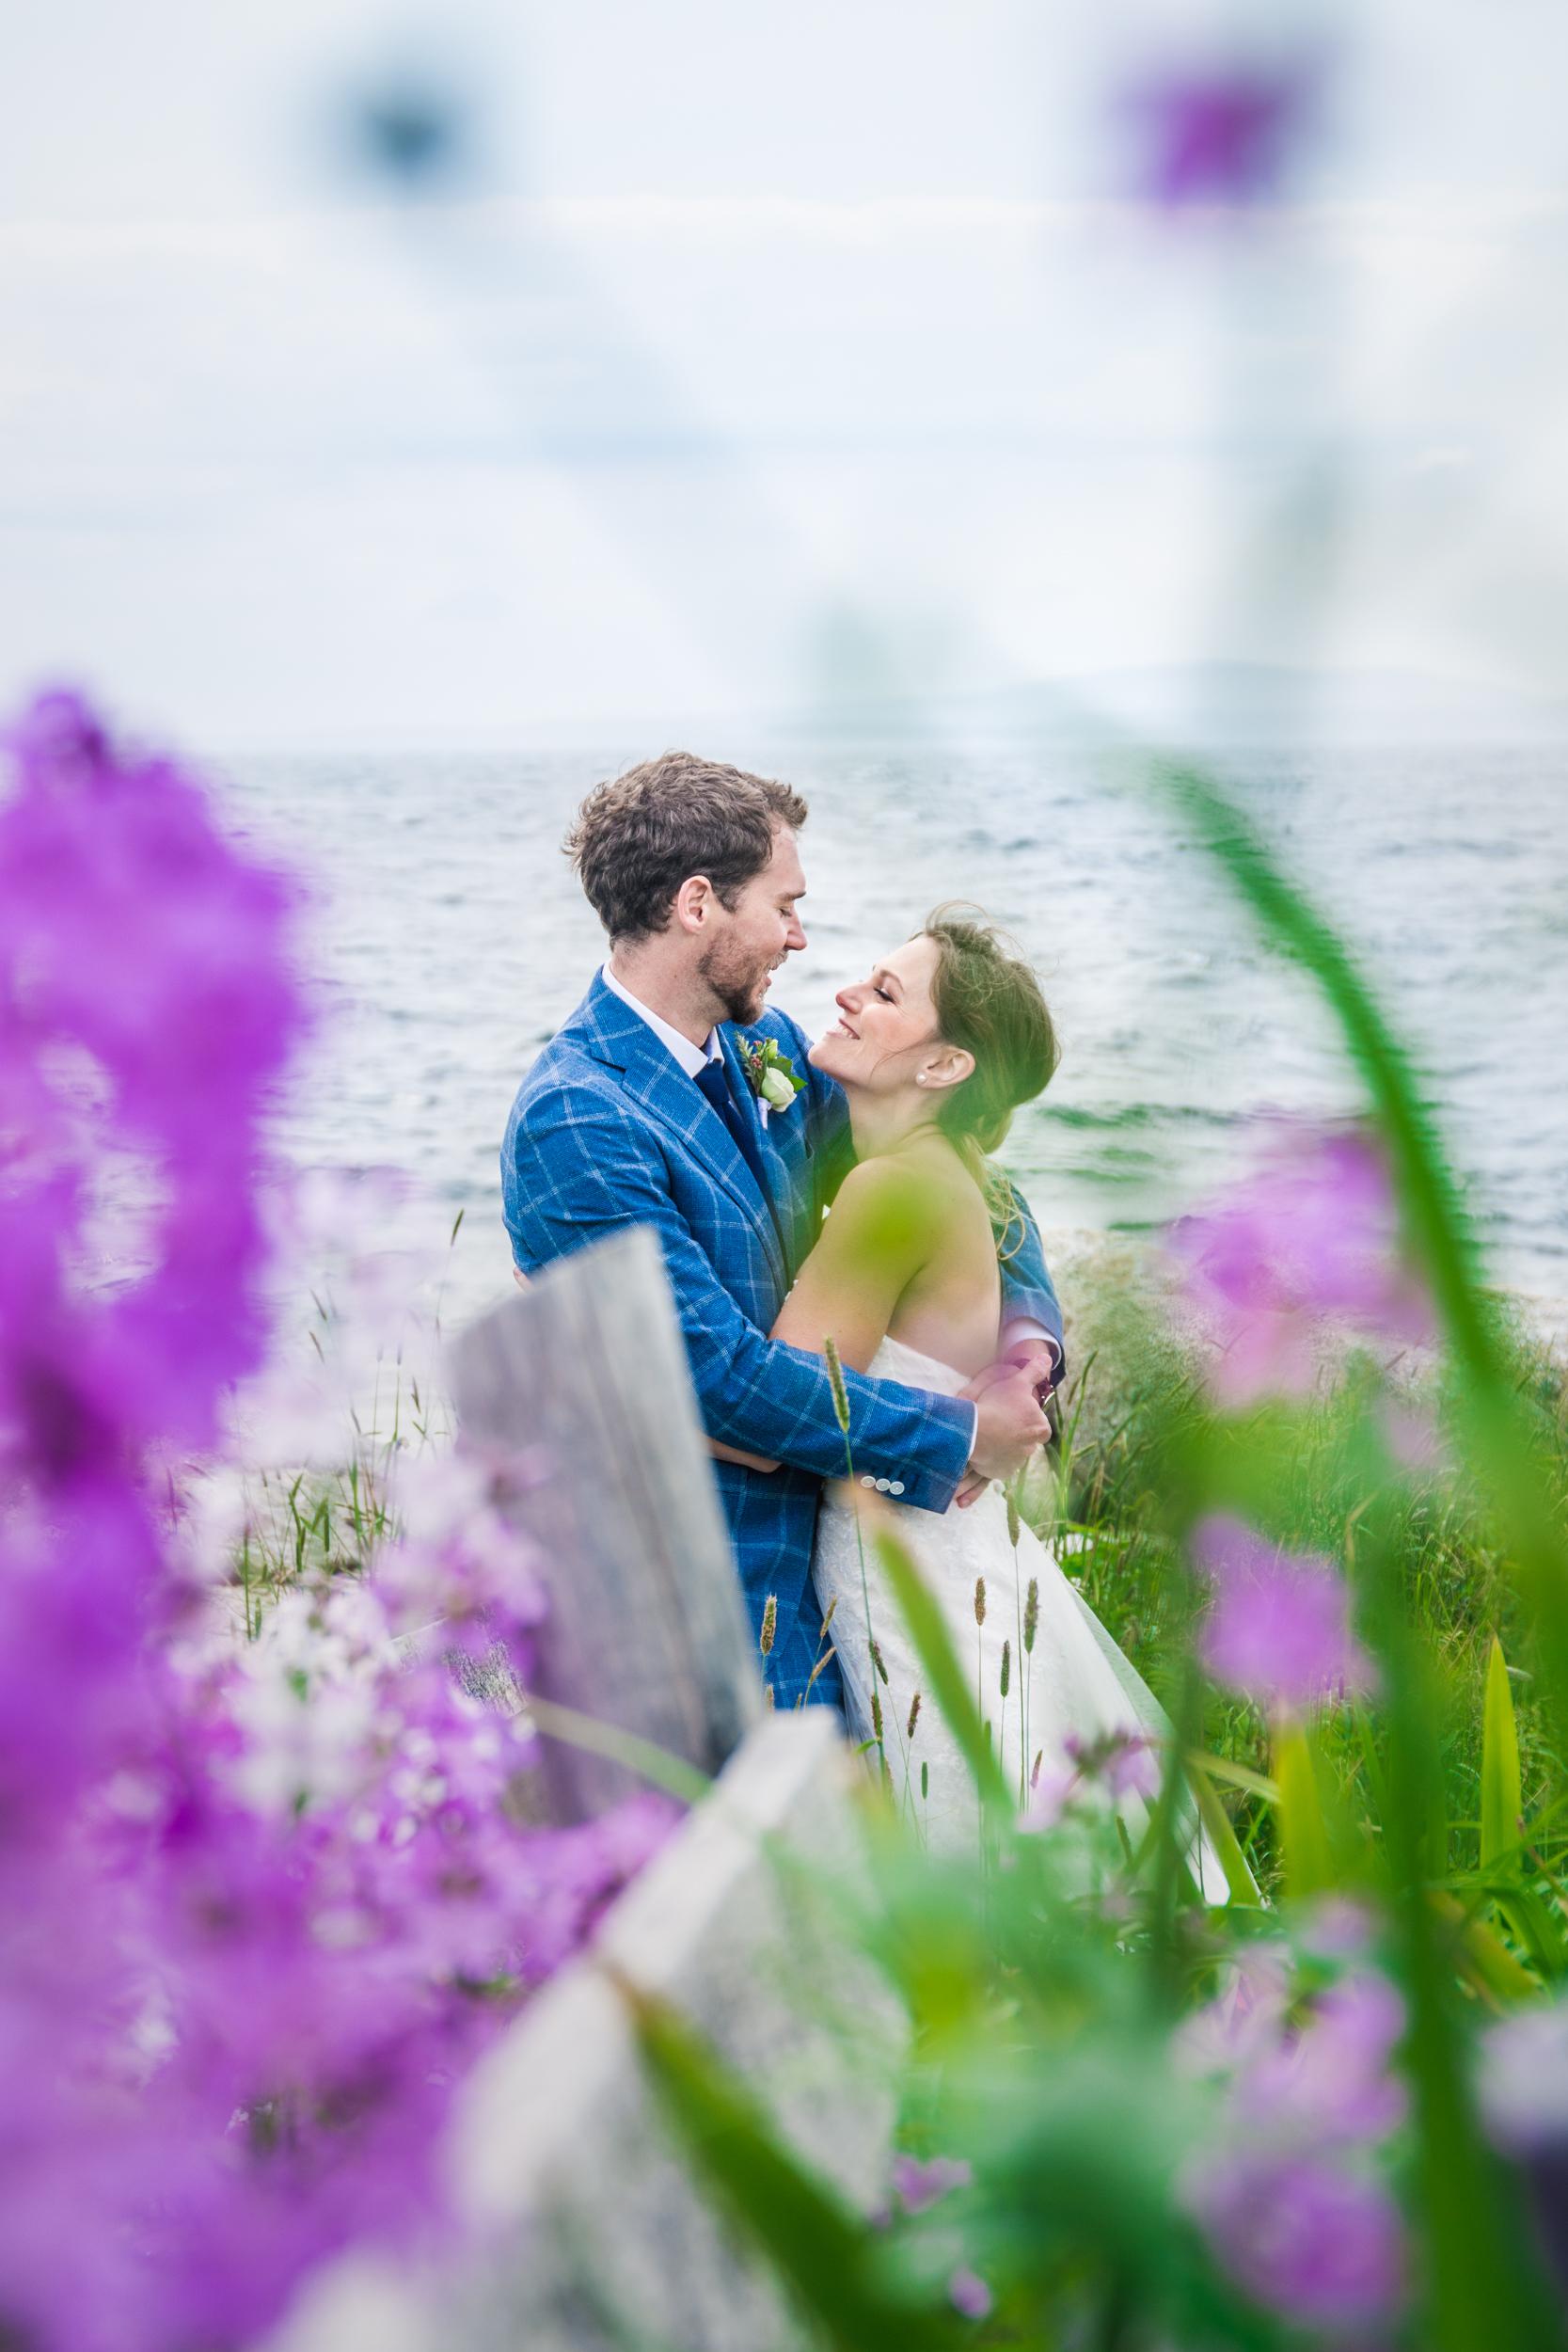 DonJess-ocean-sea-wedding-halifax-18.jpg